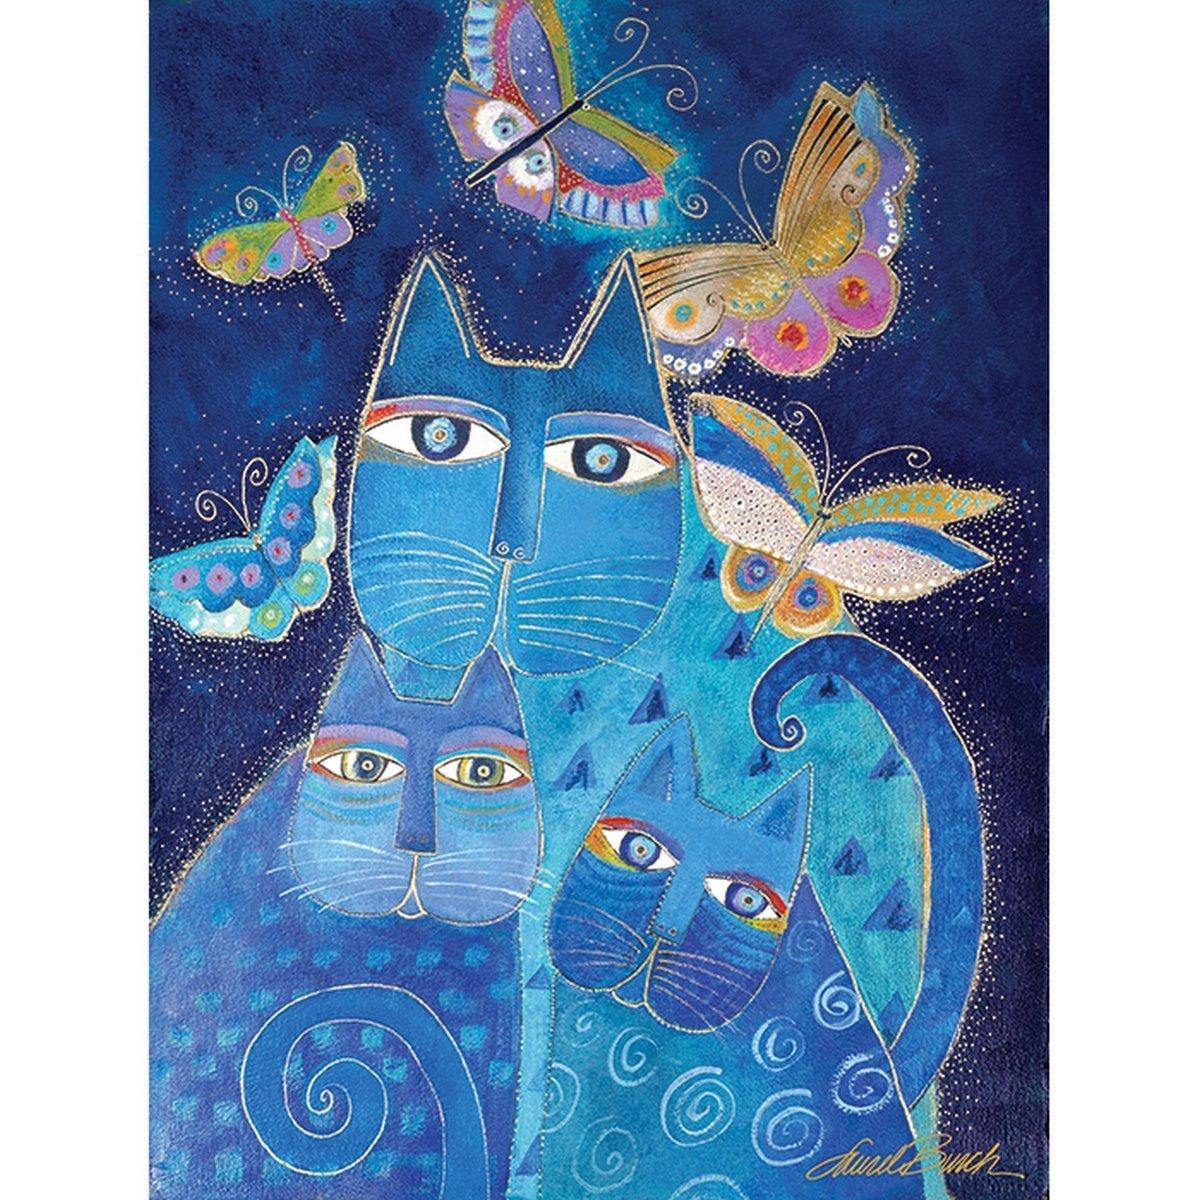 Amazon.com: Pantalla de pared, Indigo Gato con las mariposas, 12 por 16